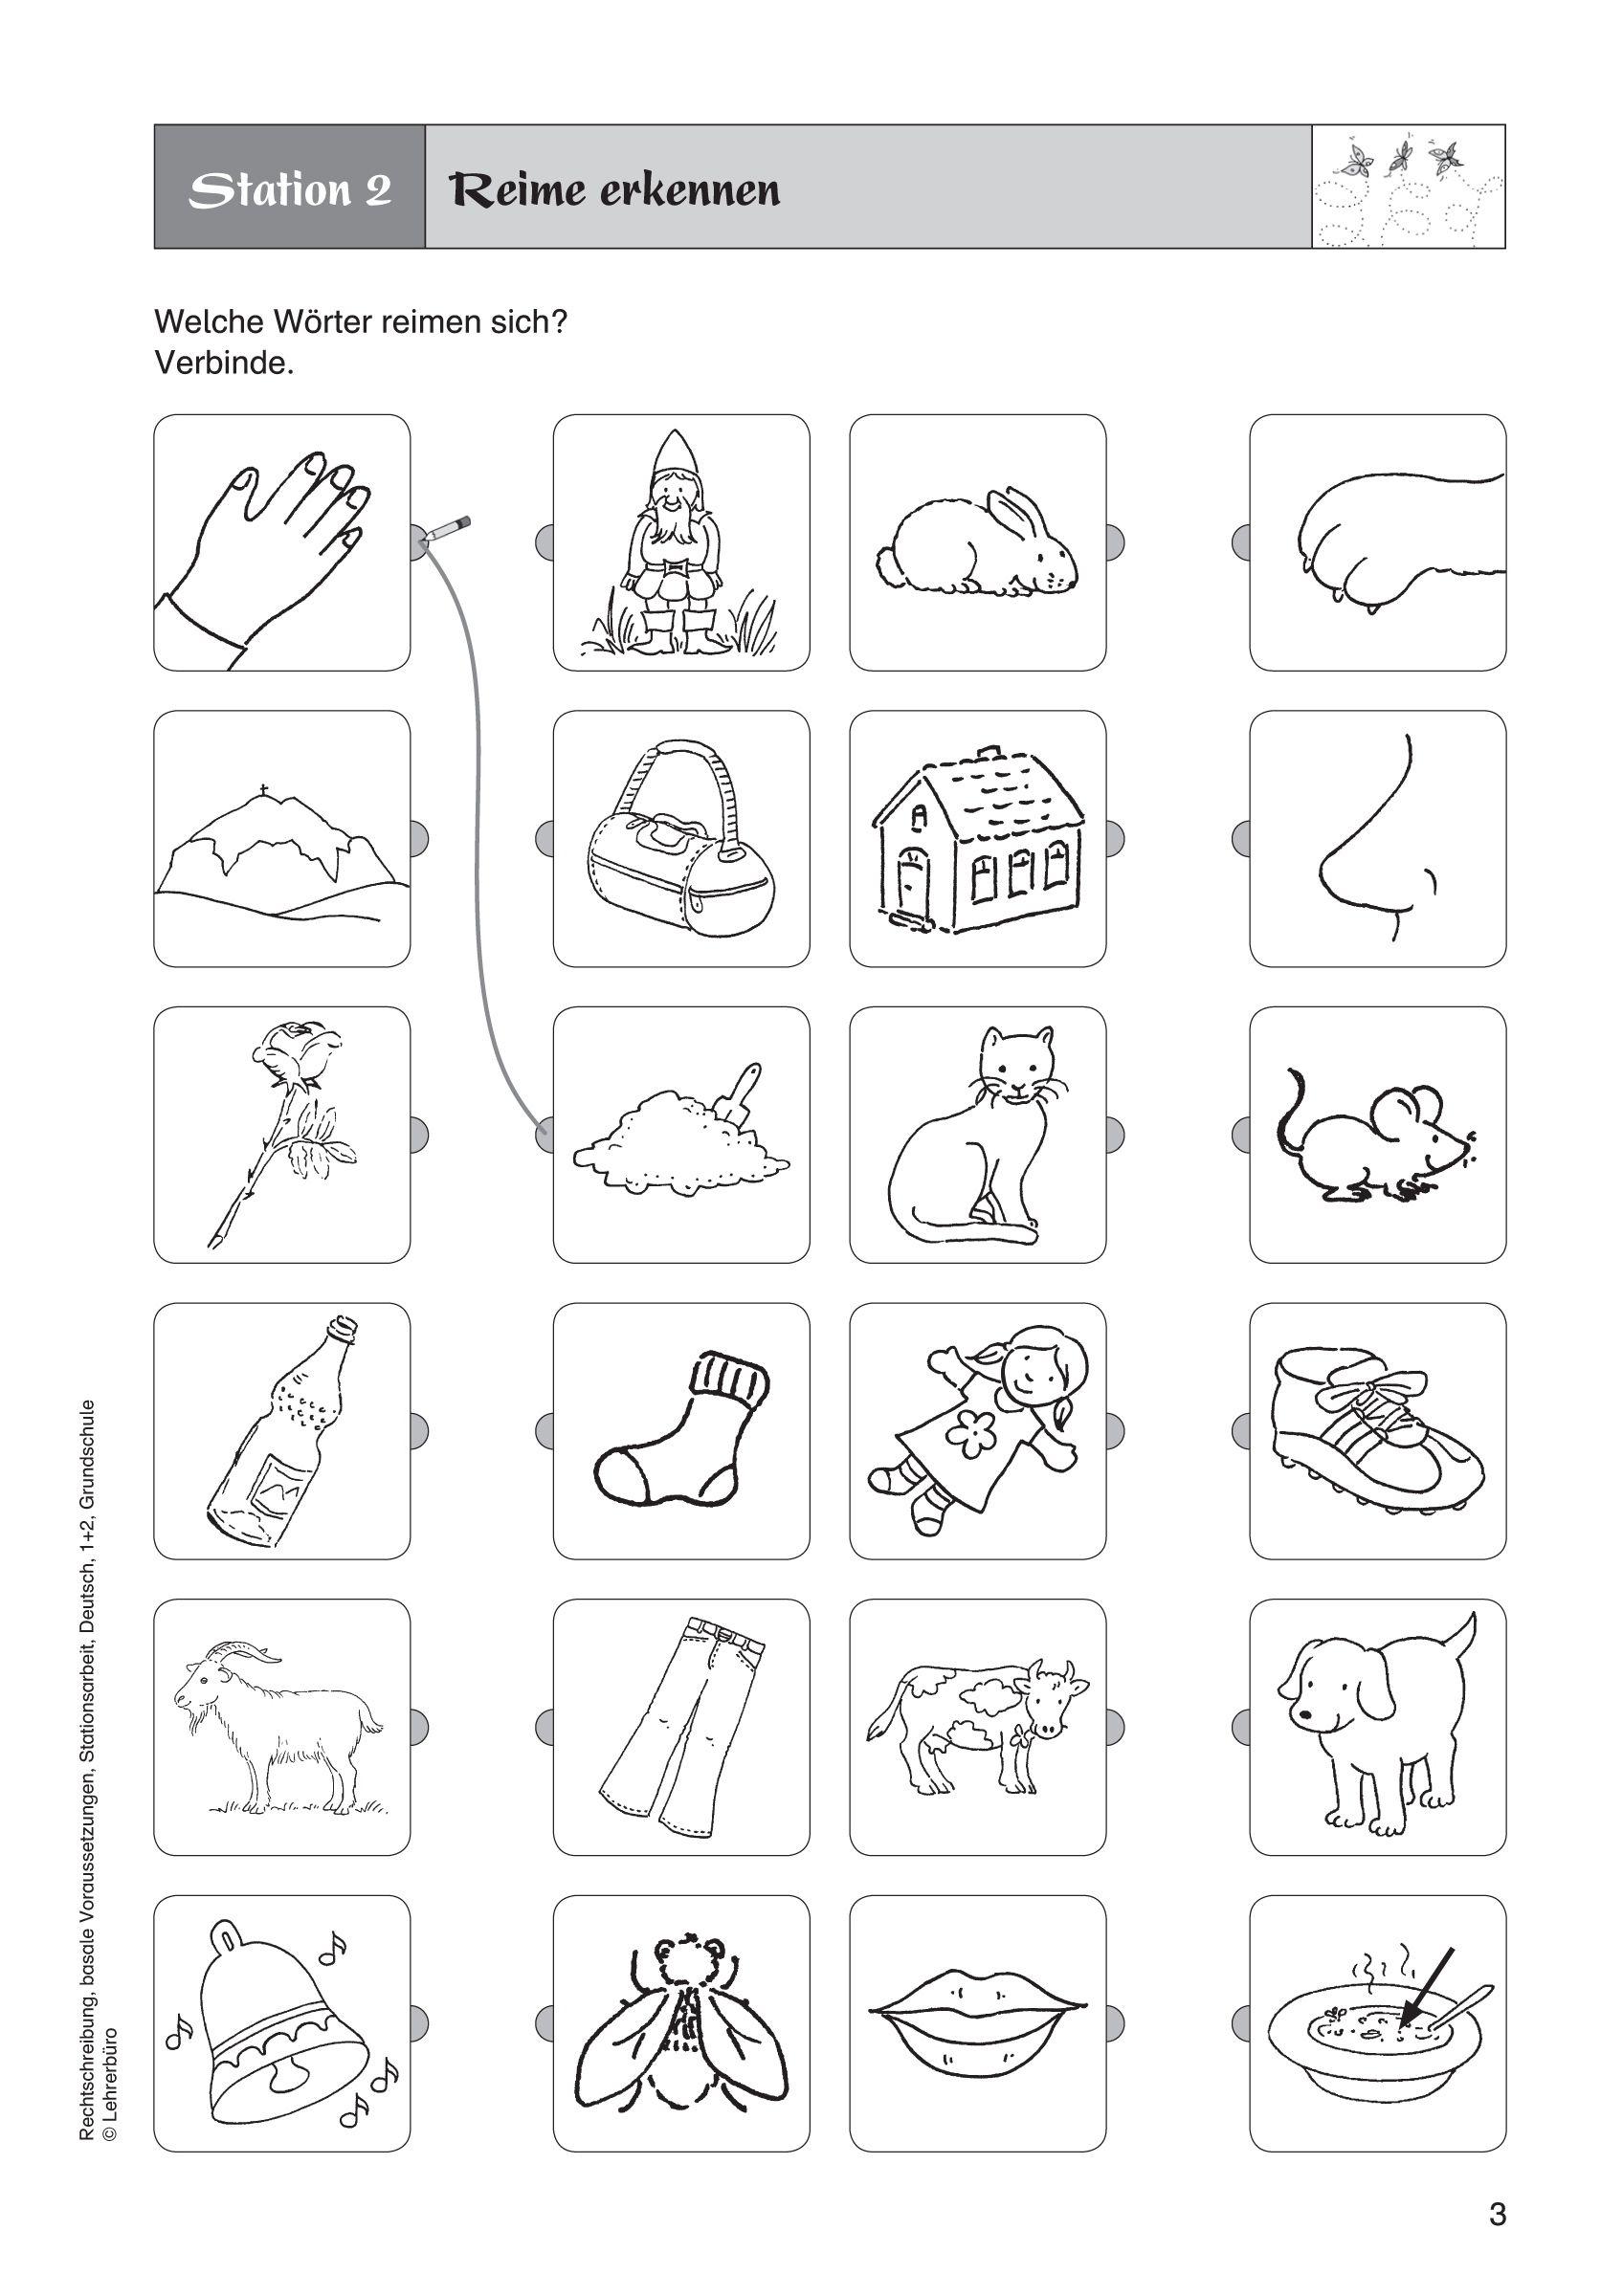 Arbeitsblätter Grundschule 1 Klasse Ausdrucken 1 Klasse in Arbeitsblätter Vorschule Kostenlos Ausdrucken